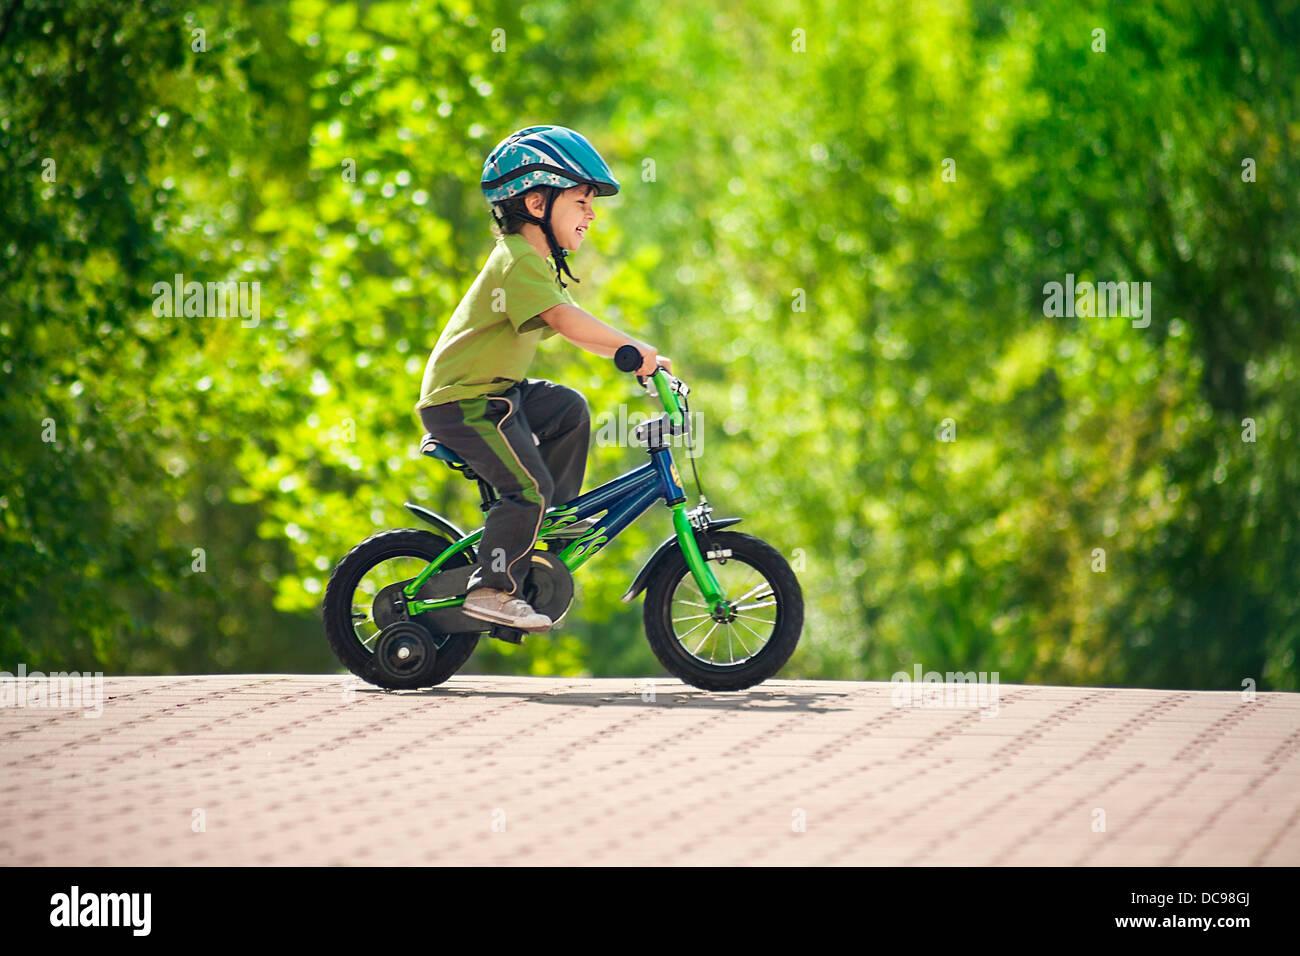 boy in a helmet riding bike - Stock Image